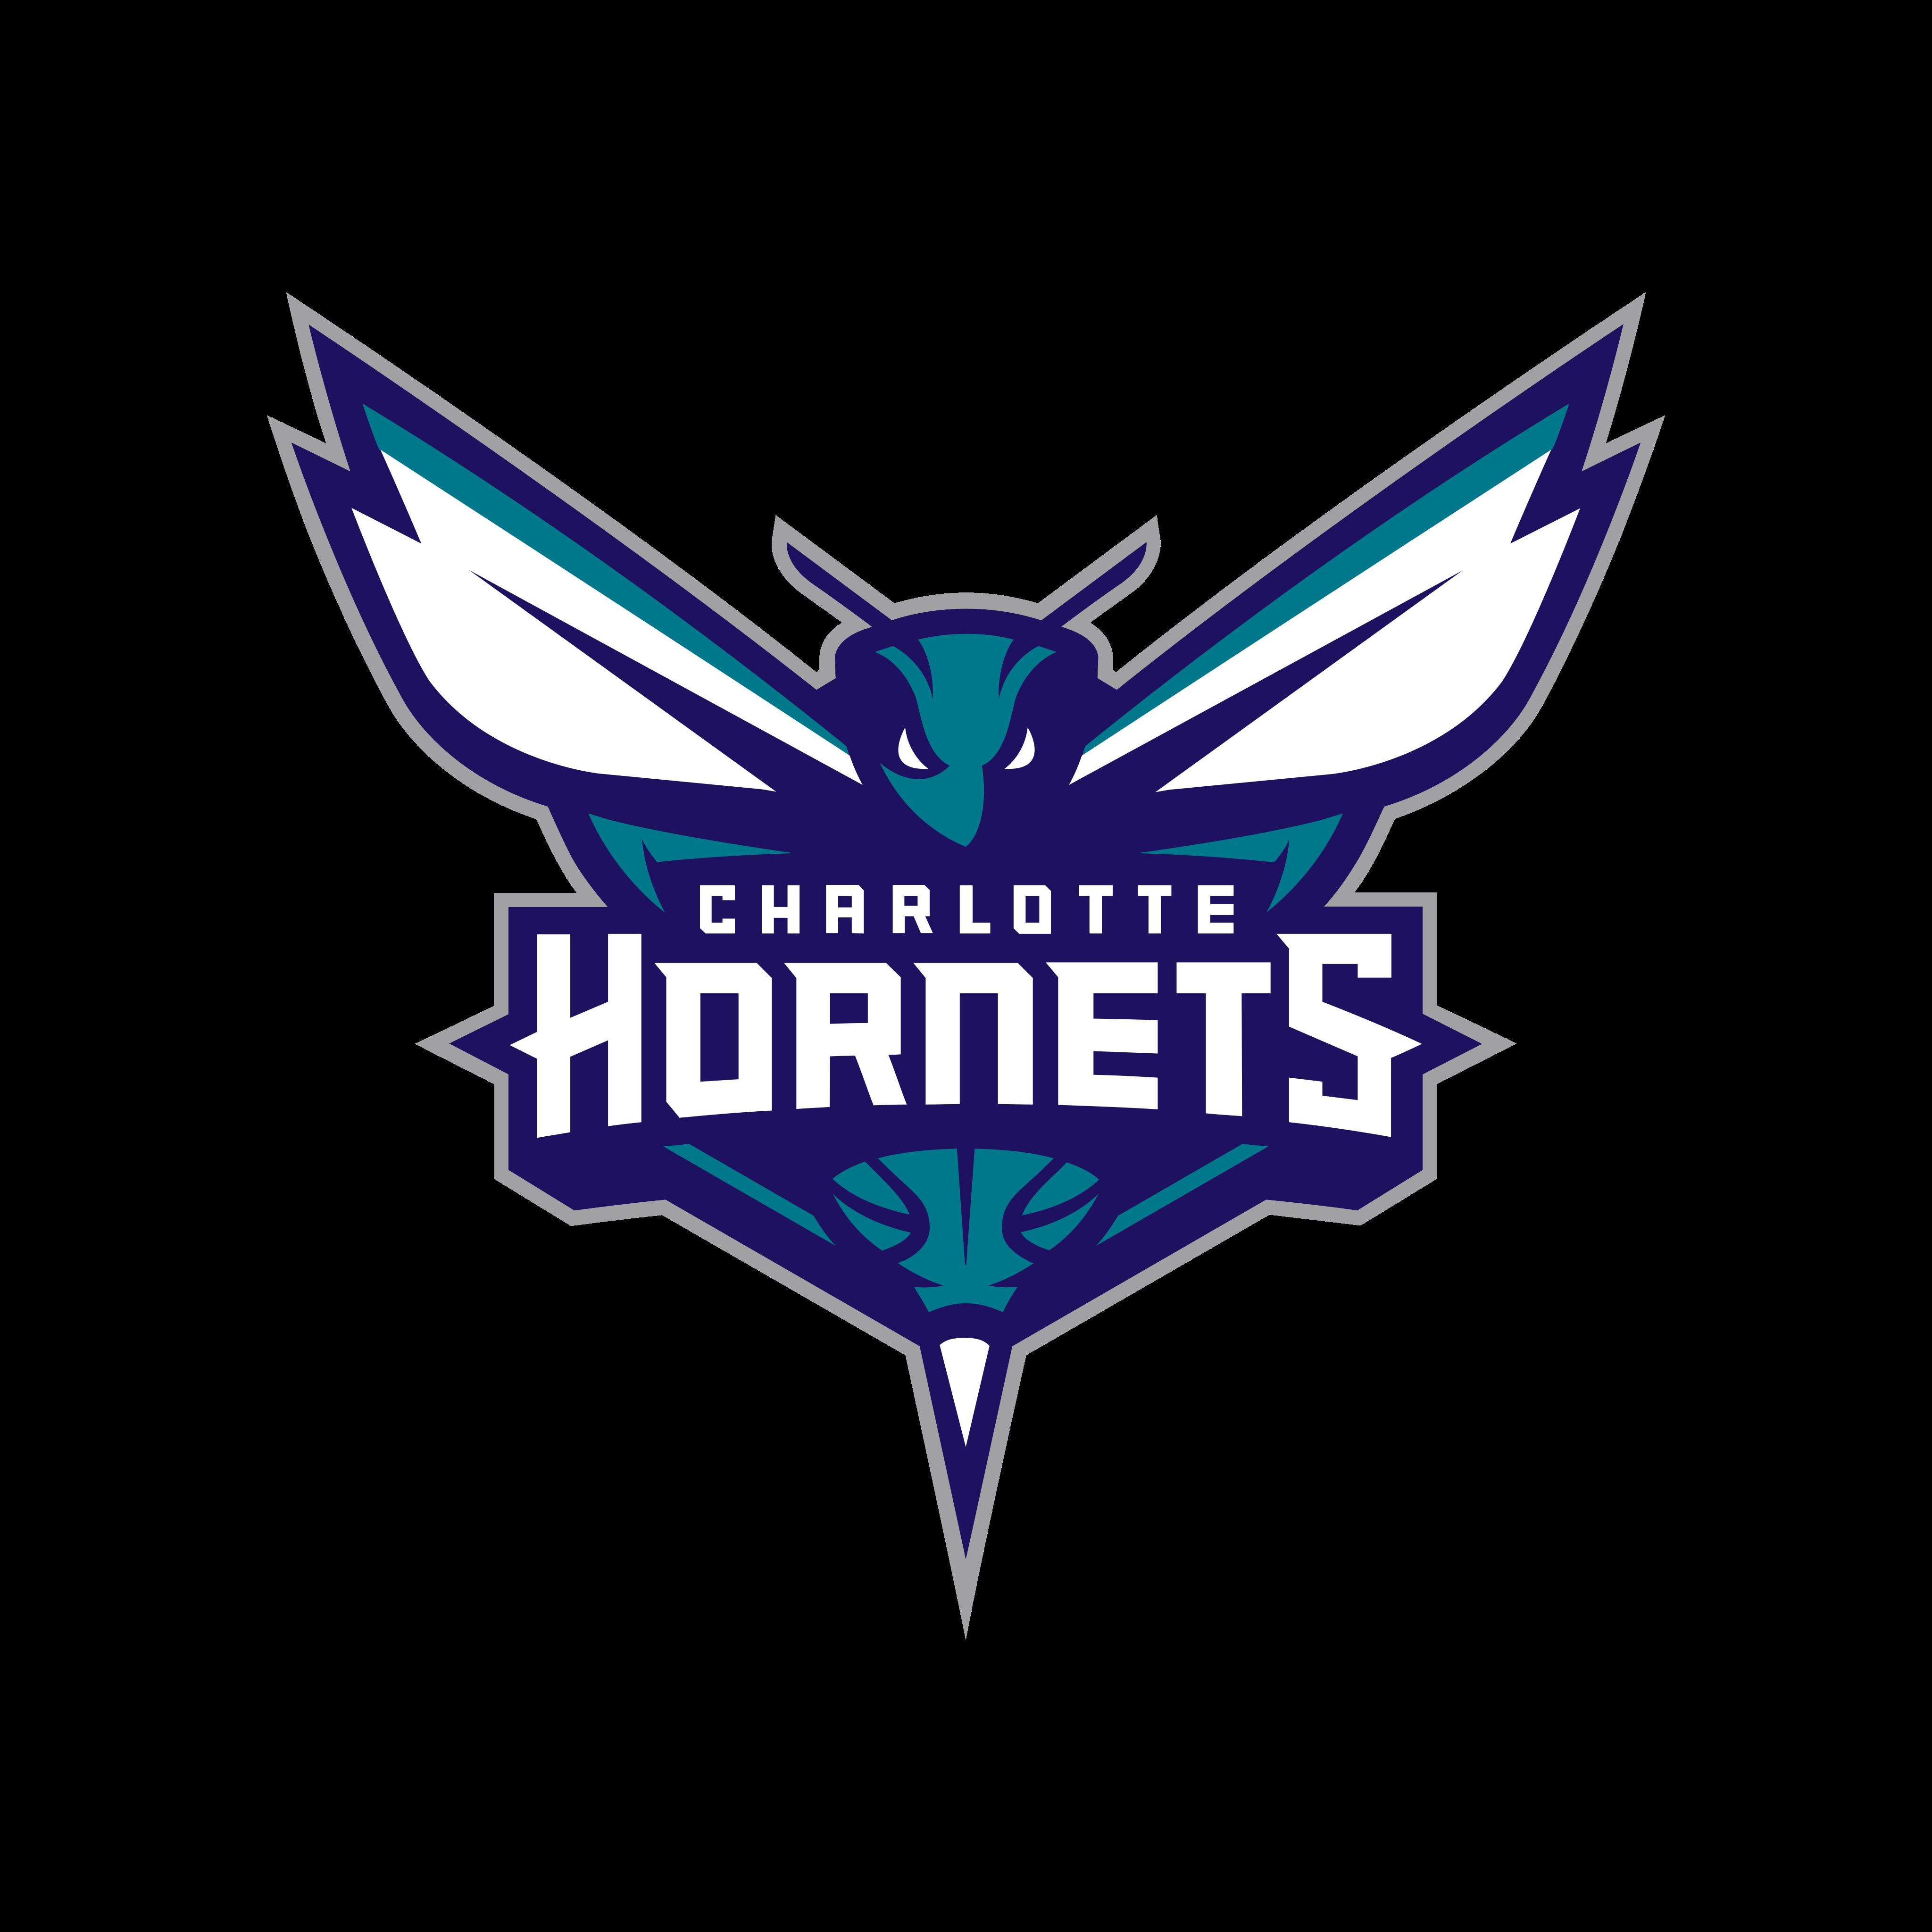 charlotte hornets logo 0 - Charlotte Hornets Logo